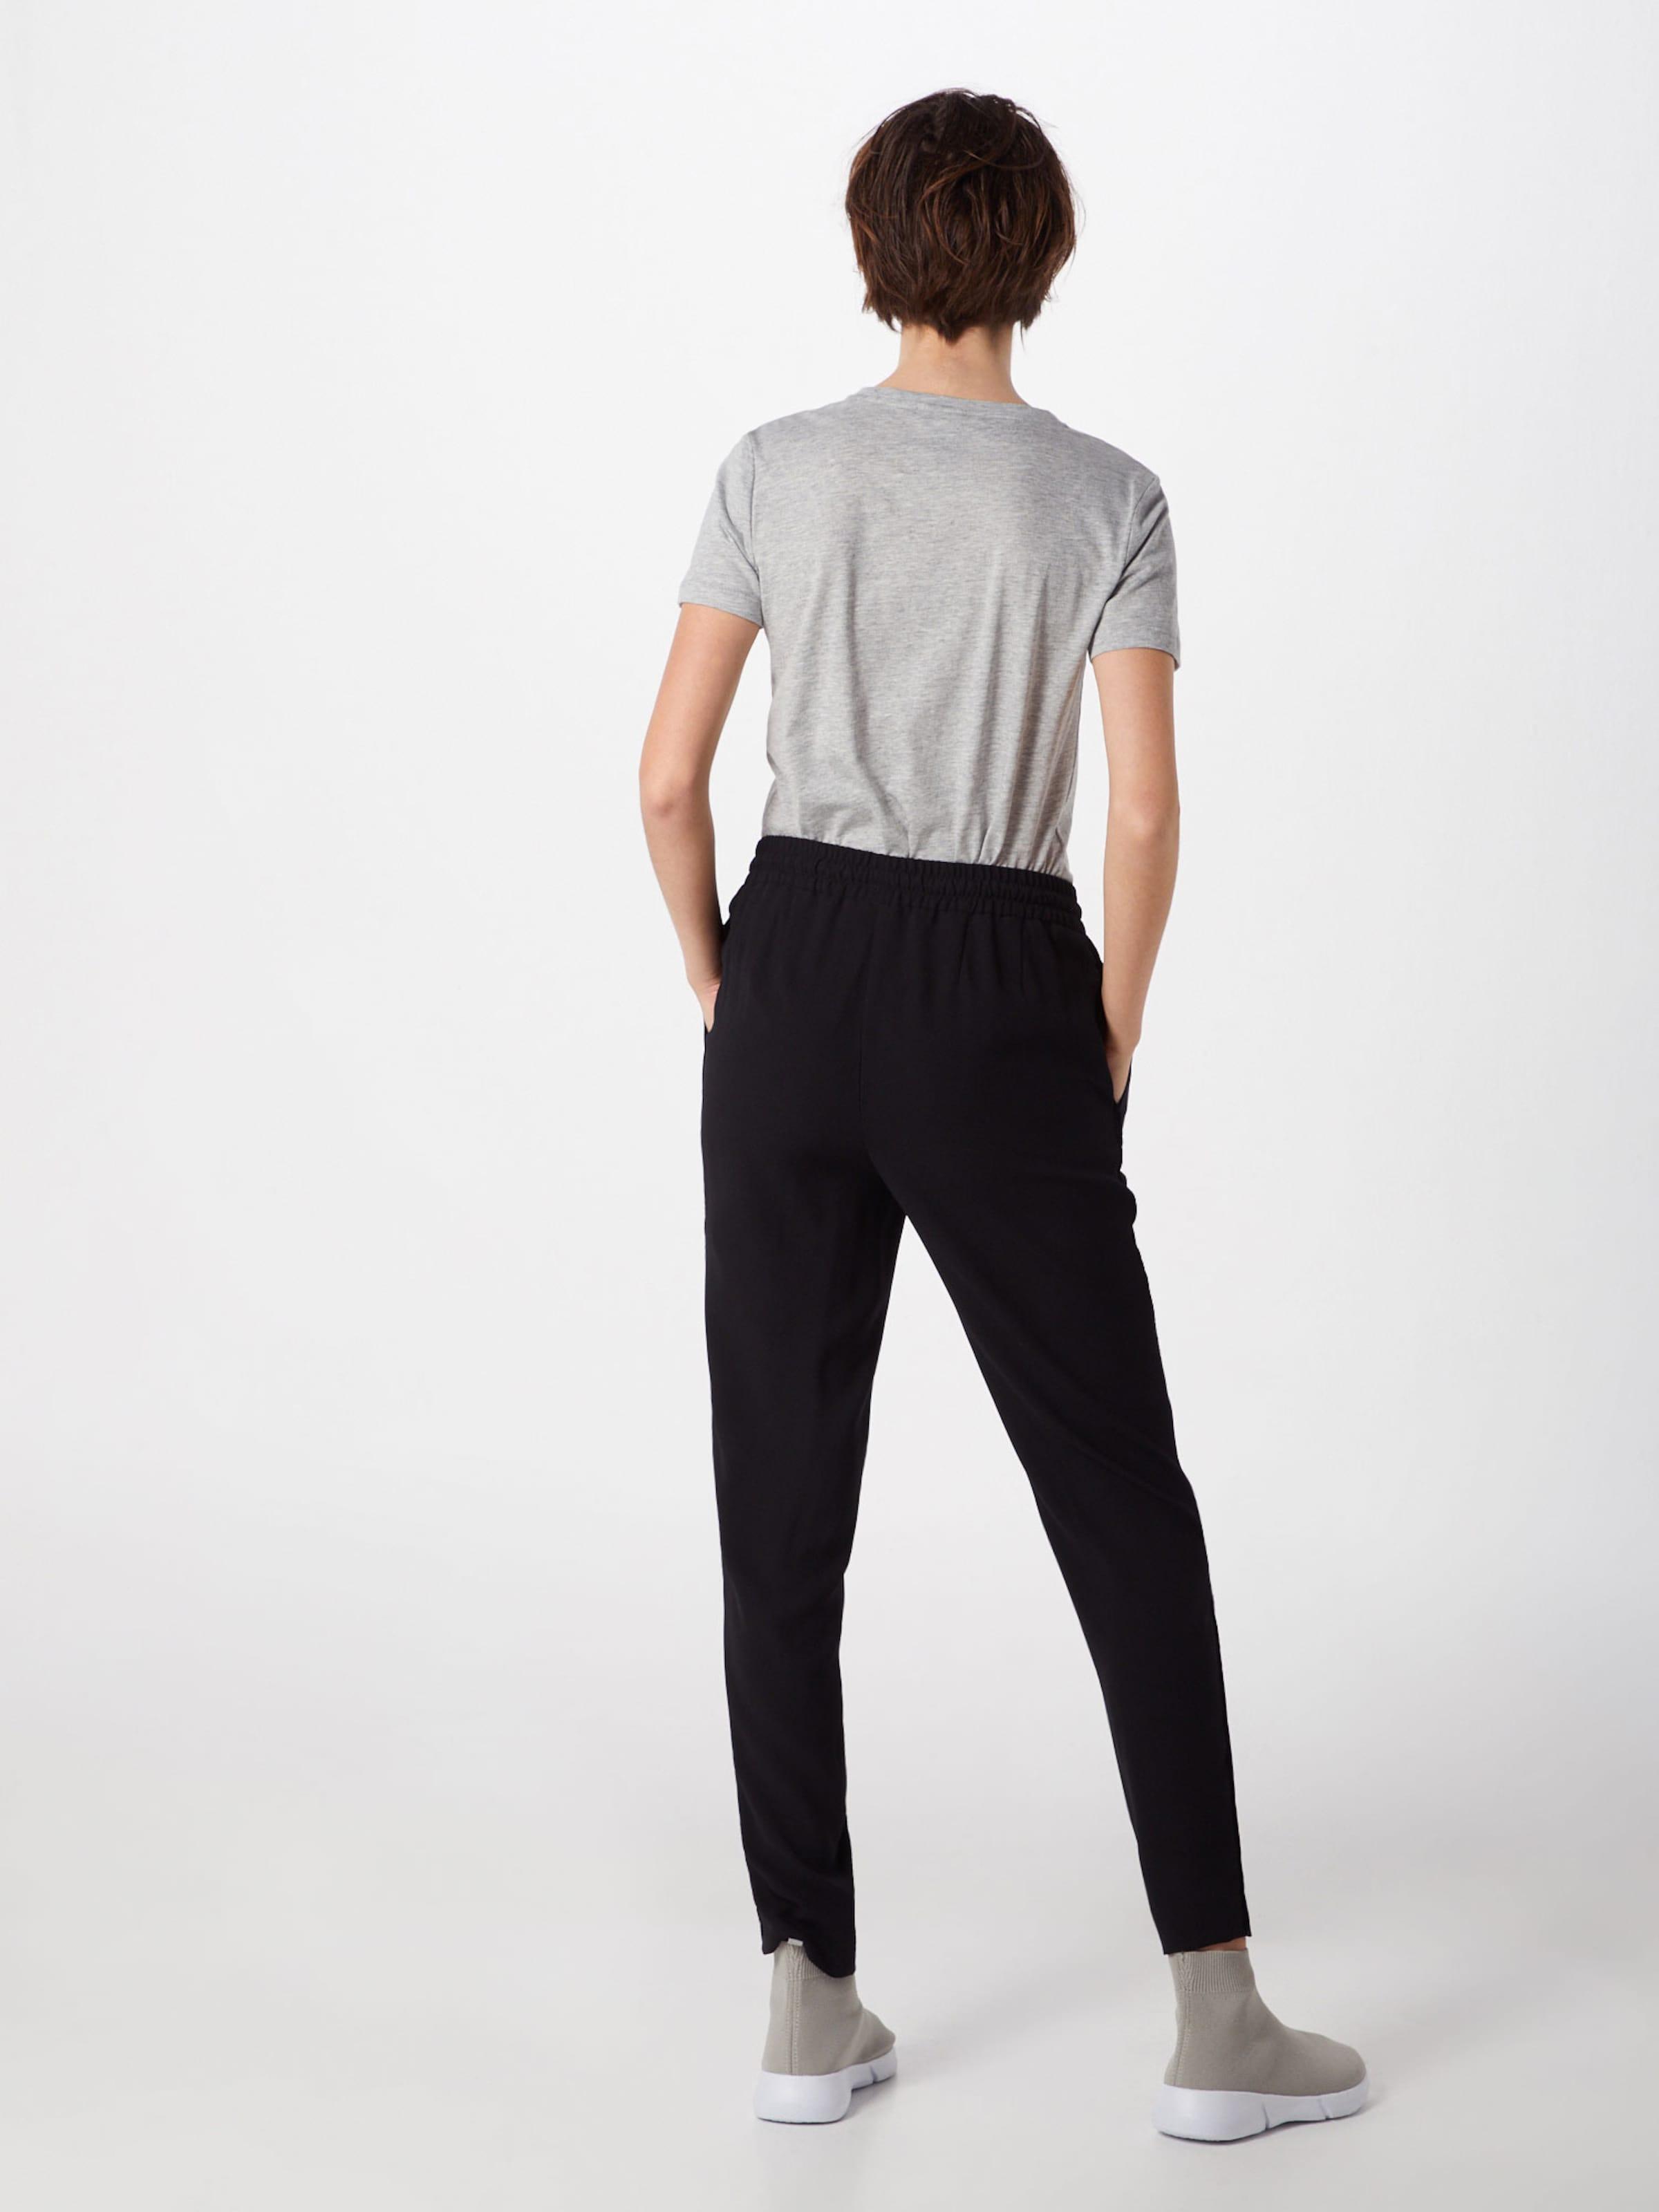 Noir Dkny On Pant' Pantalon En 'pull 3L5ARq4j